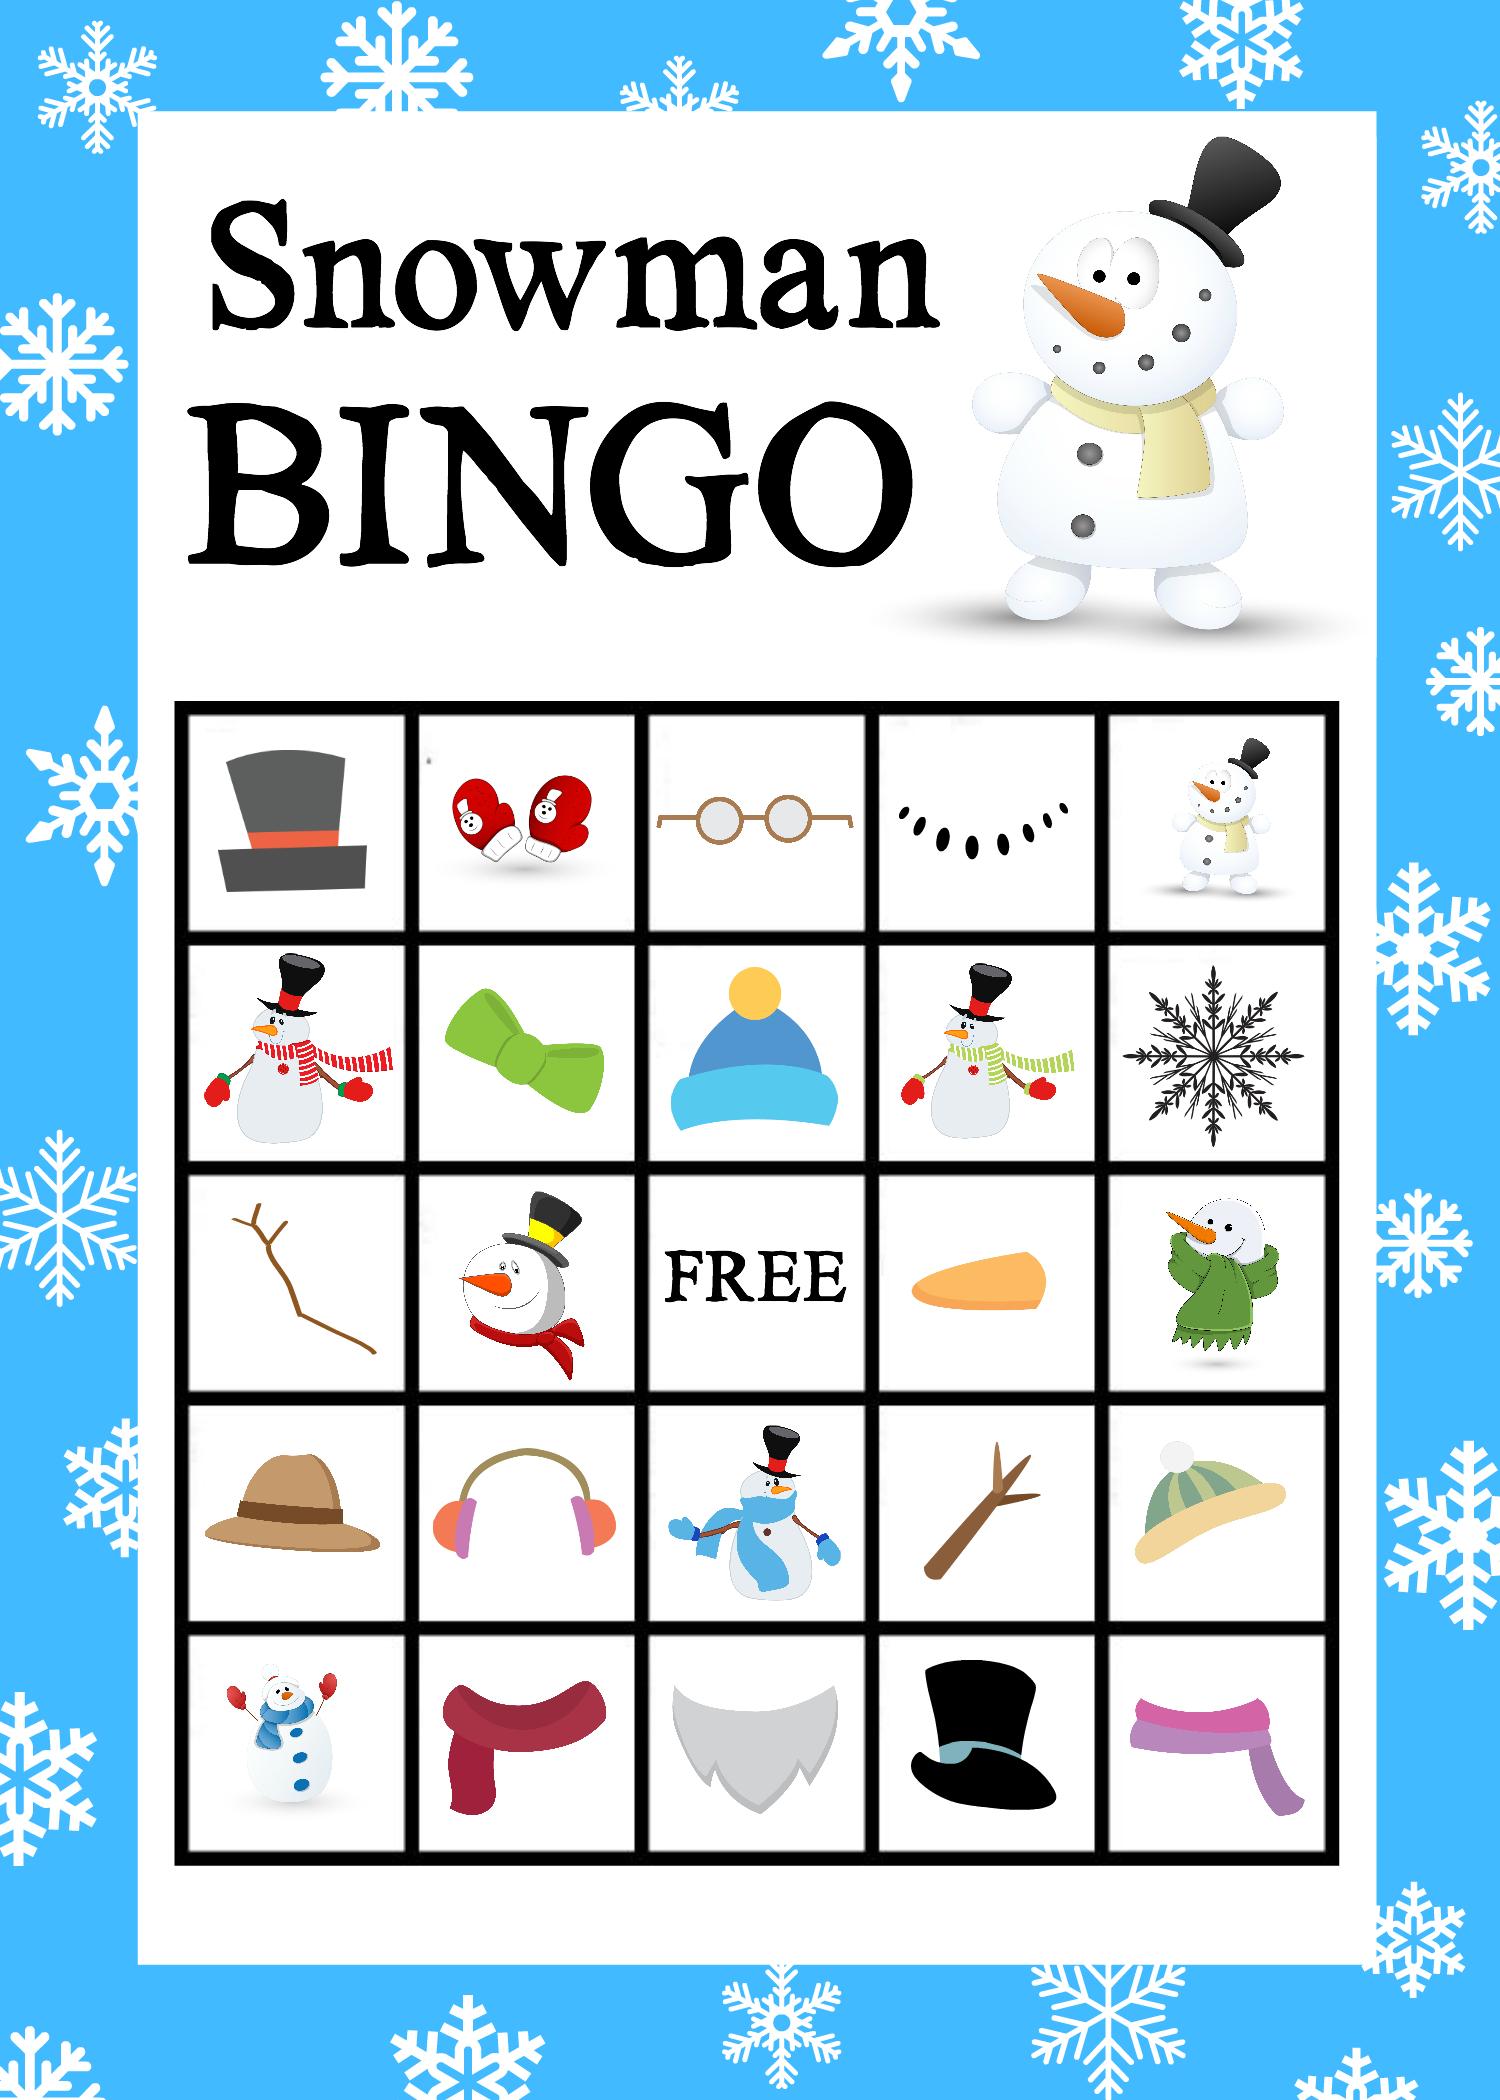 Printable Snowman Bingo Game | Snowman Party, School Holiday